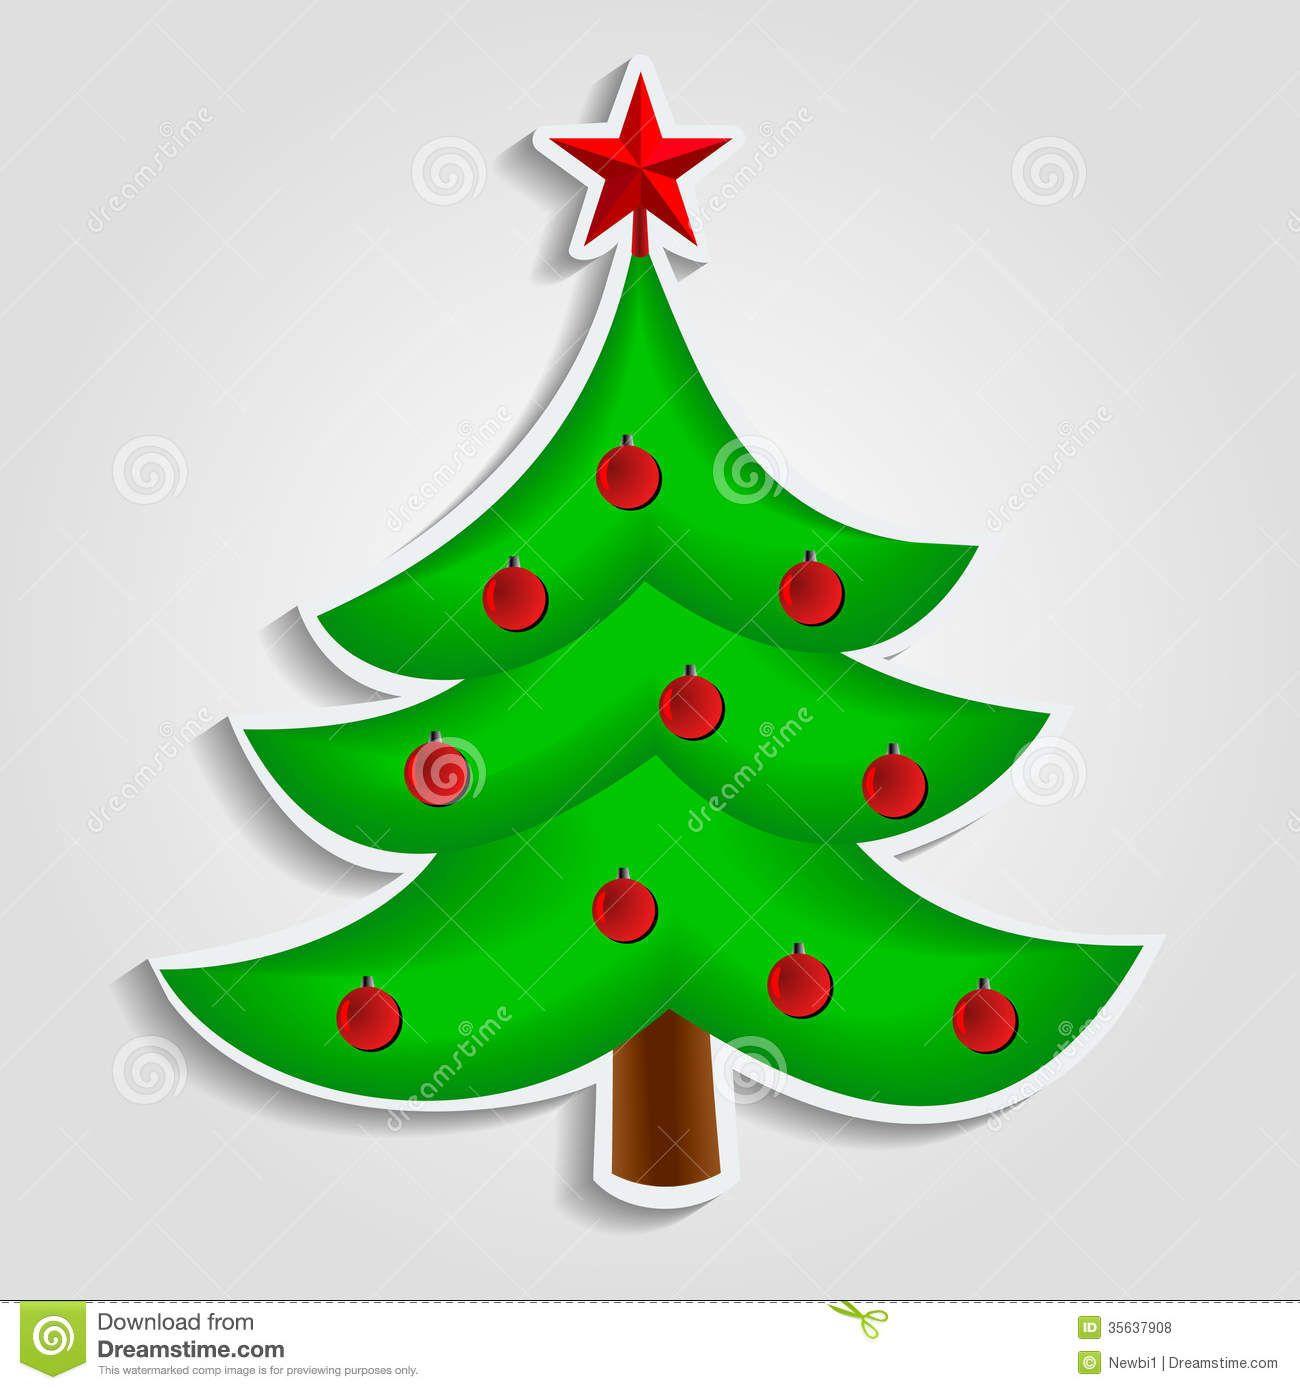 Christmas Tree Design · GL Stock Images | Design Ideas | Pinterest ...